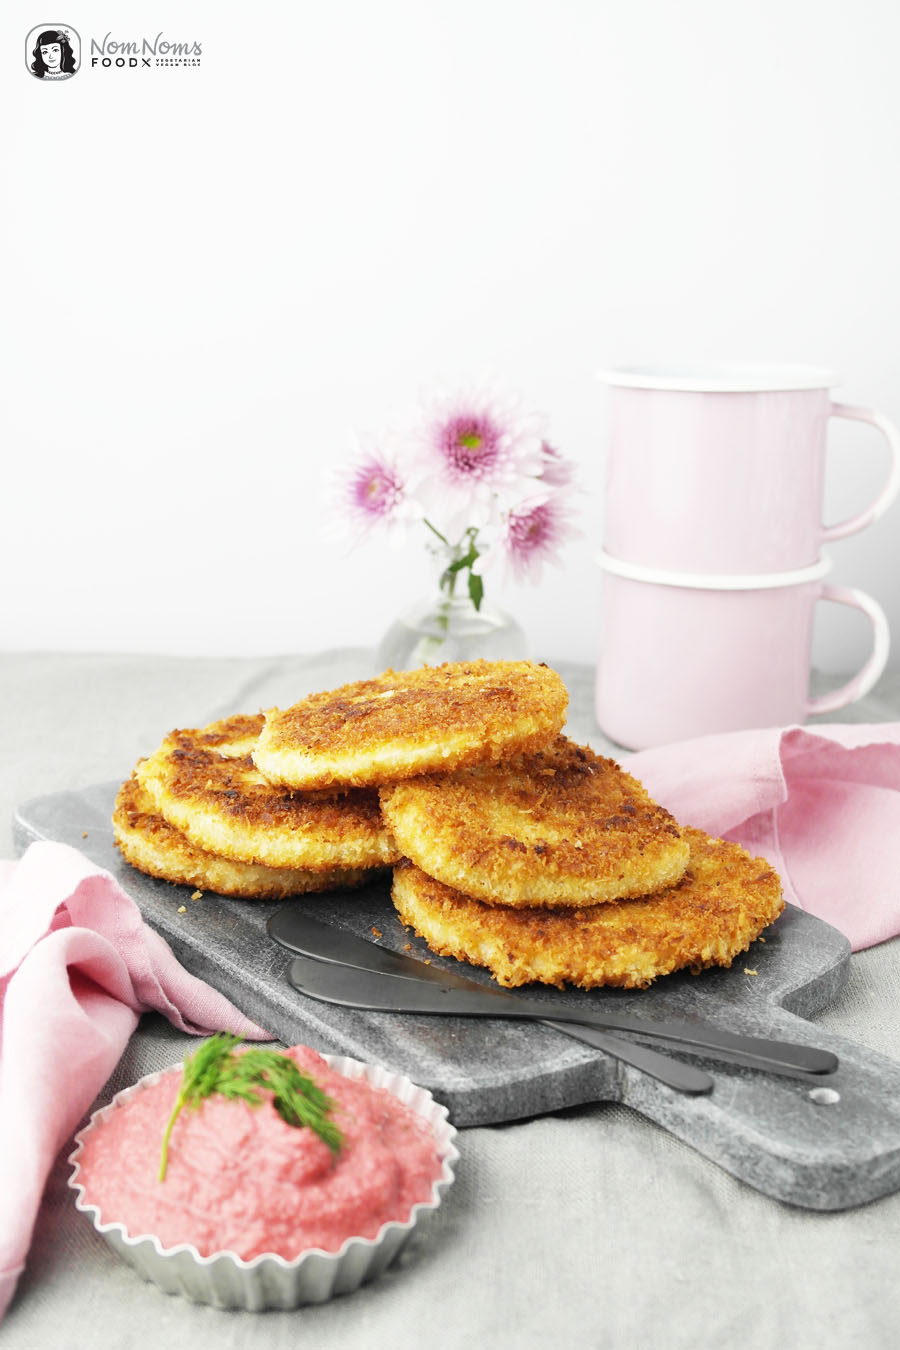 Sellerie-Schnitzel mit Rote-Bete-Apfel-Meerrettich-Dip